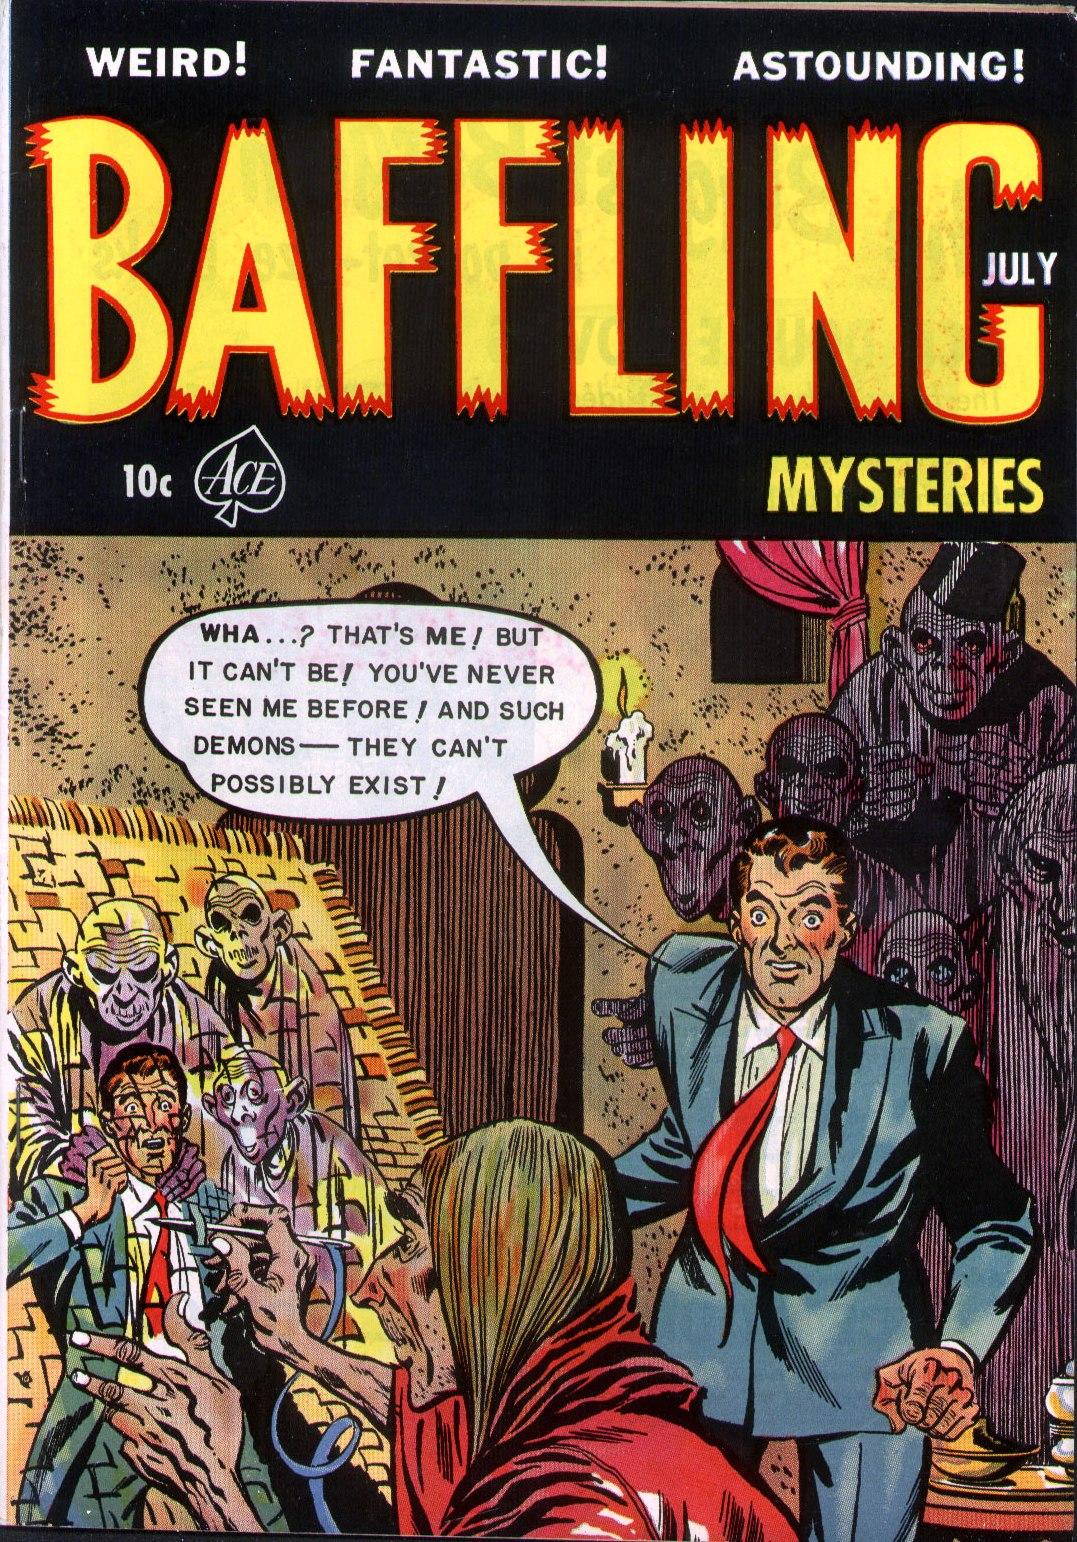 Baffling Mysteries Vol 1 16